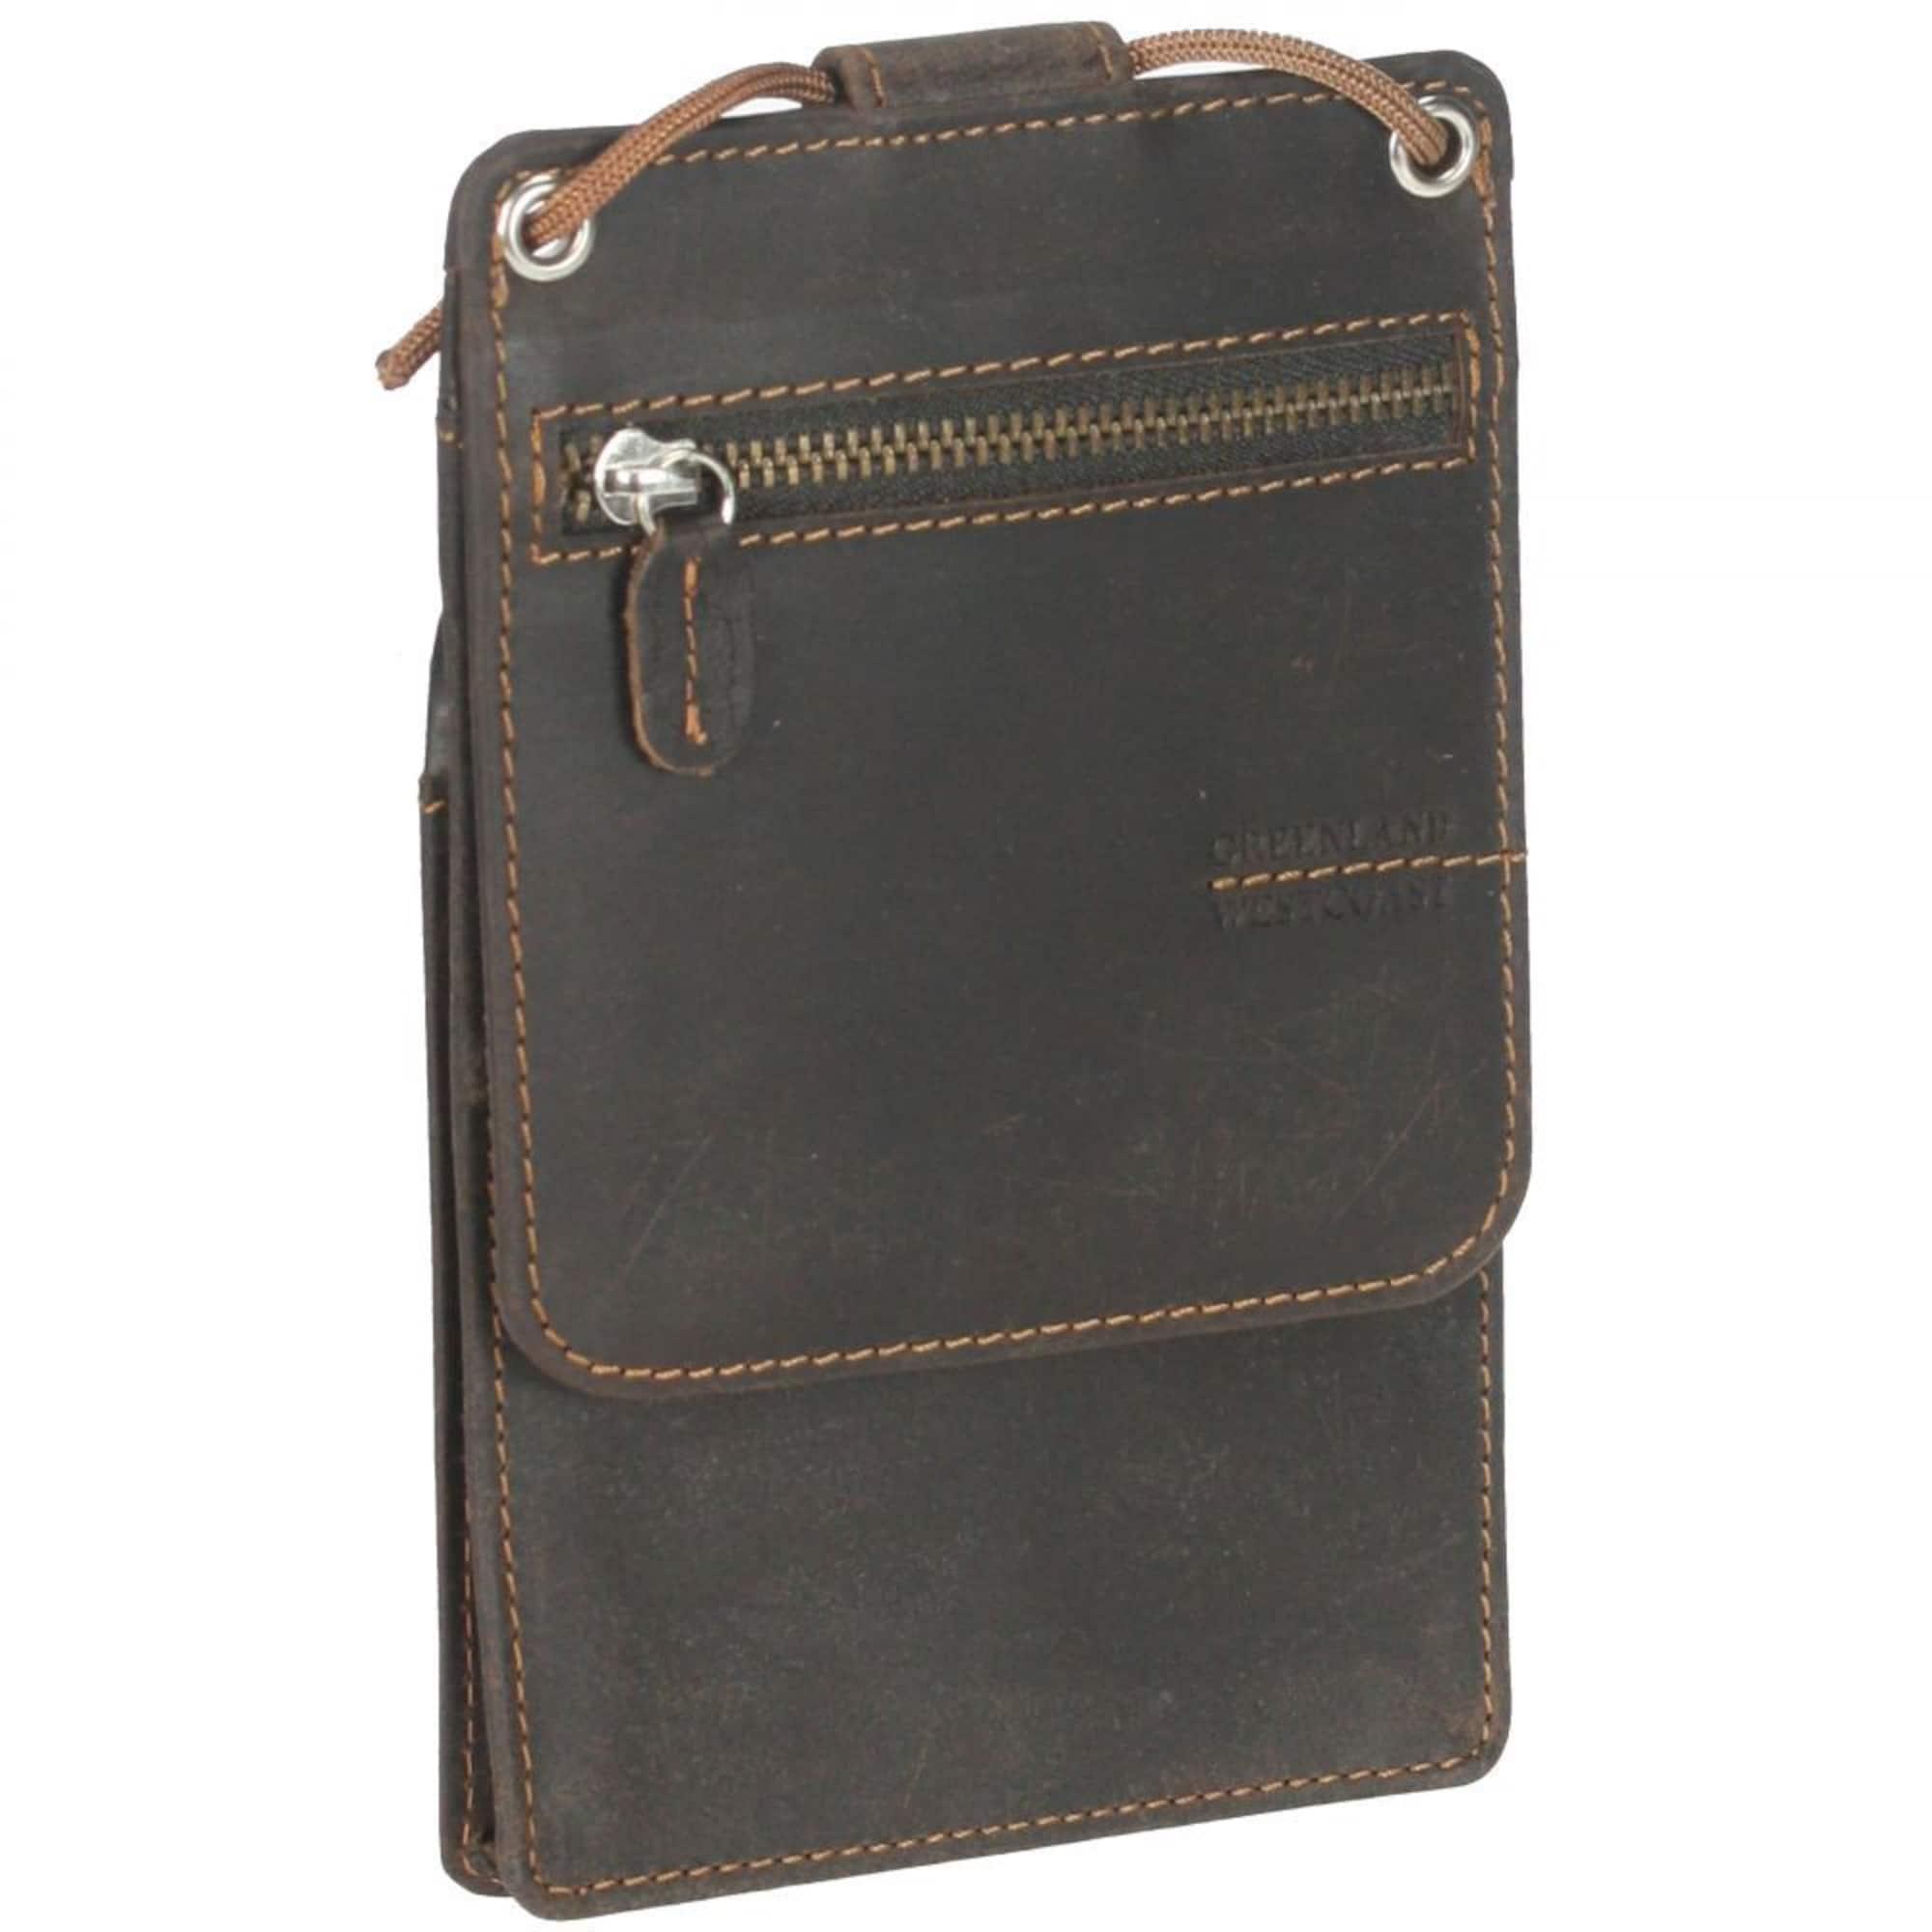 Westcoast Brustbeutel | Accessoires > Portemonnaies > Brustbeutel | GREENLAND